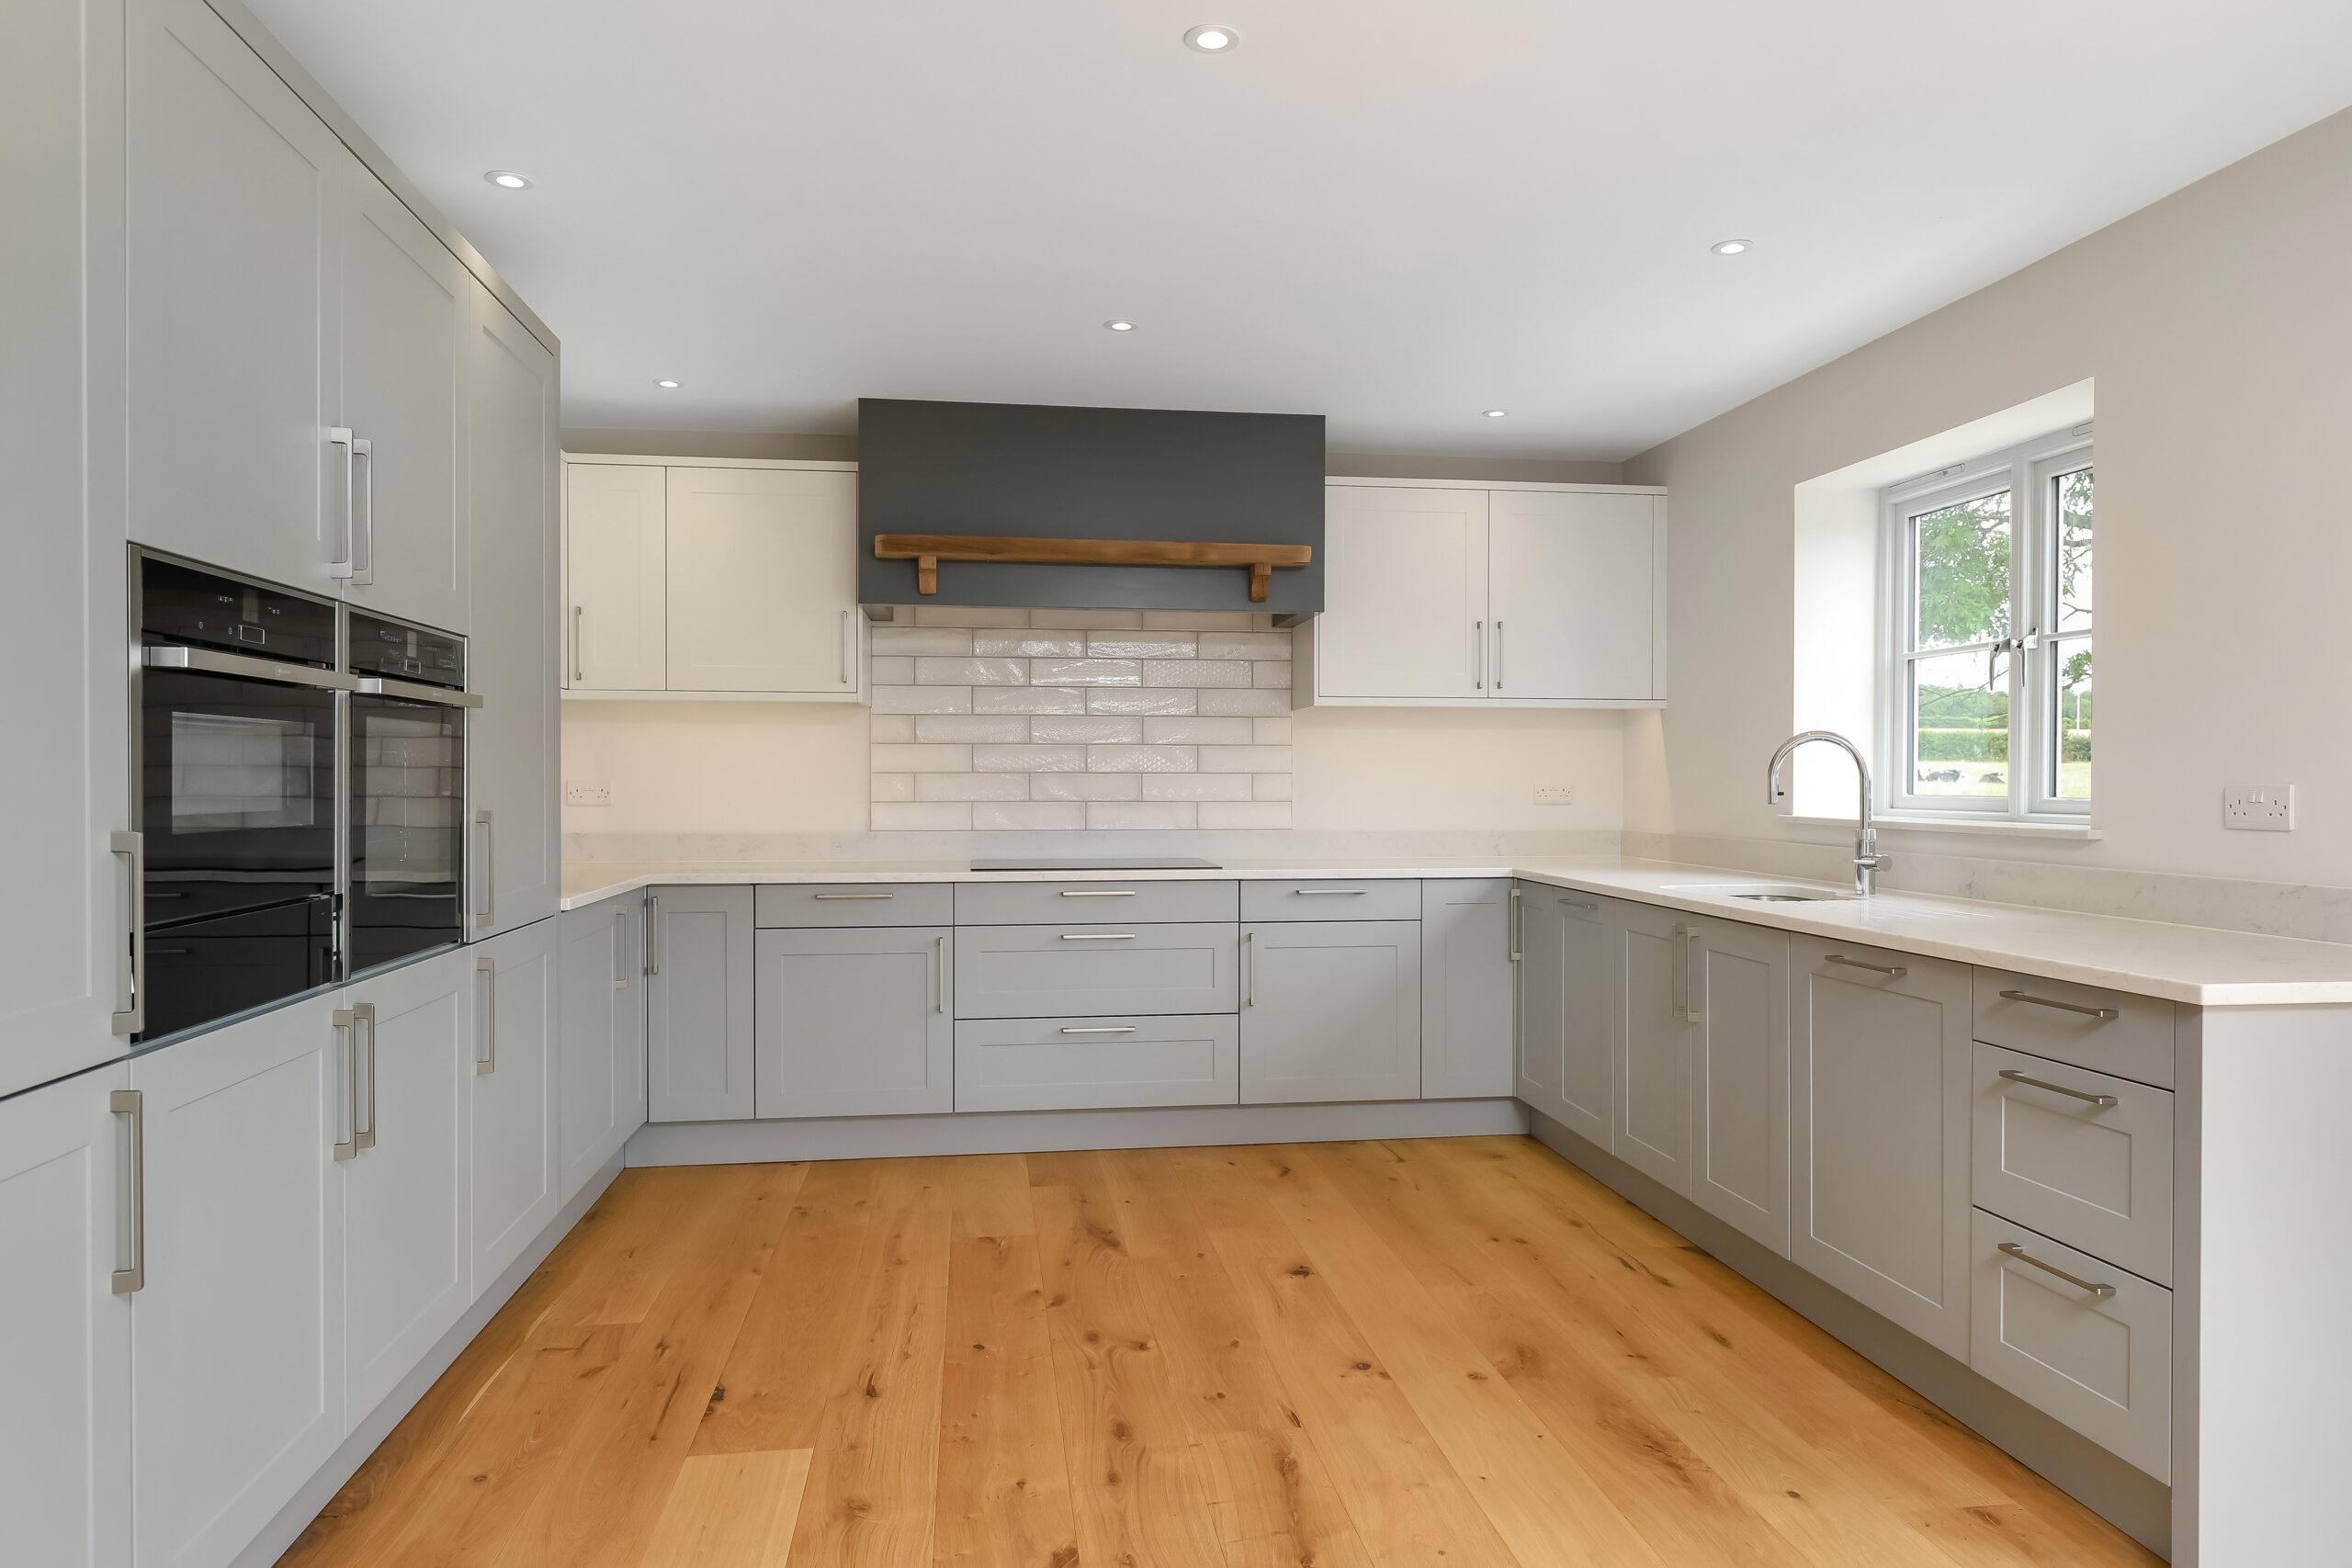 http://rbc-building.co.uk/wp-content/uploads/2020/09/Dove-Cottage-Kitchen-2-scaled.jpg